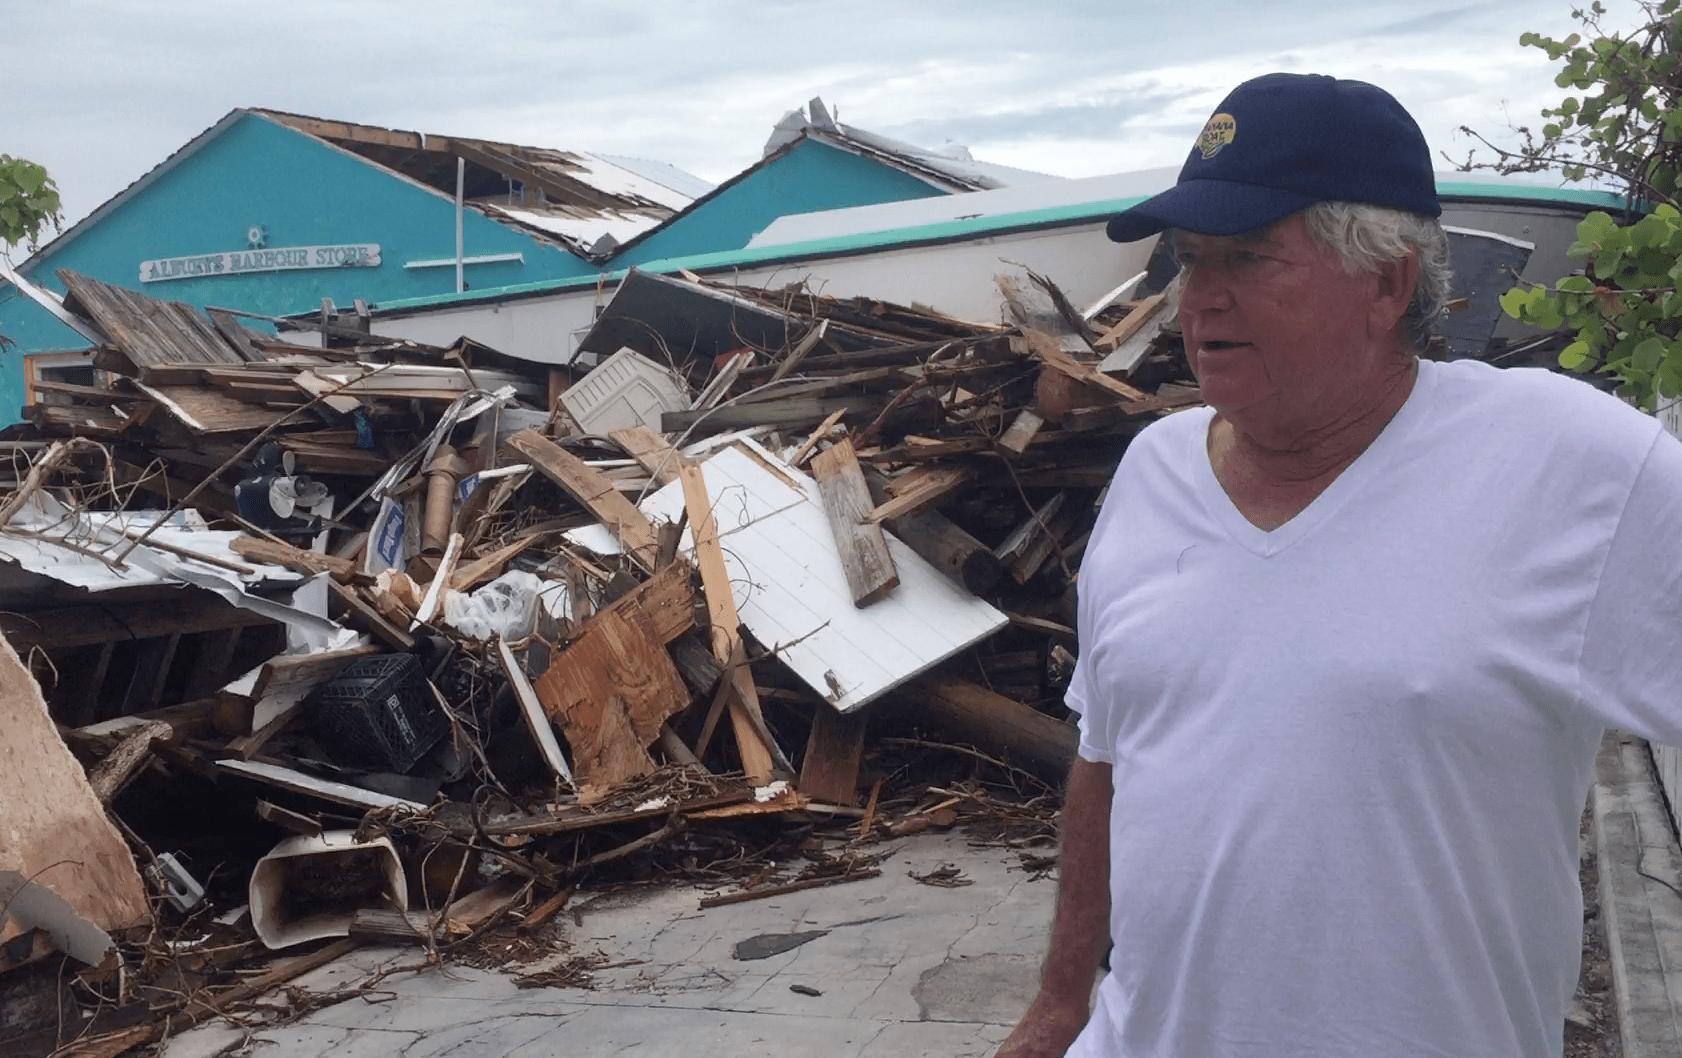 Life after Dorian: Man-O-War Cay destruction 'our own version of Hiroshima'